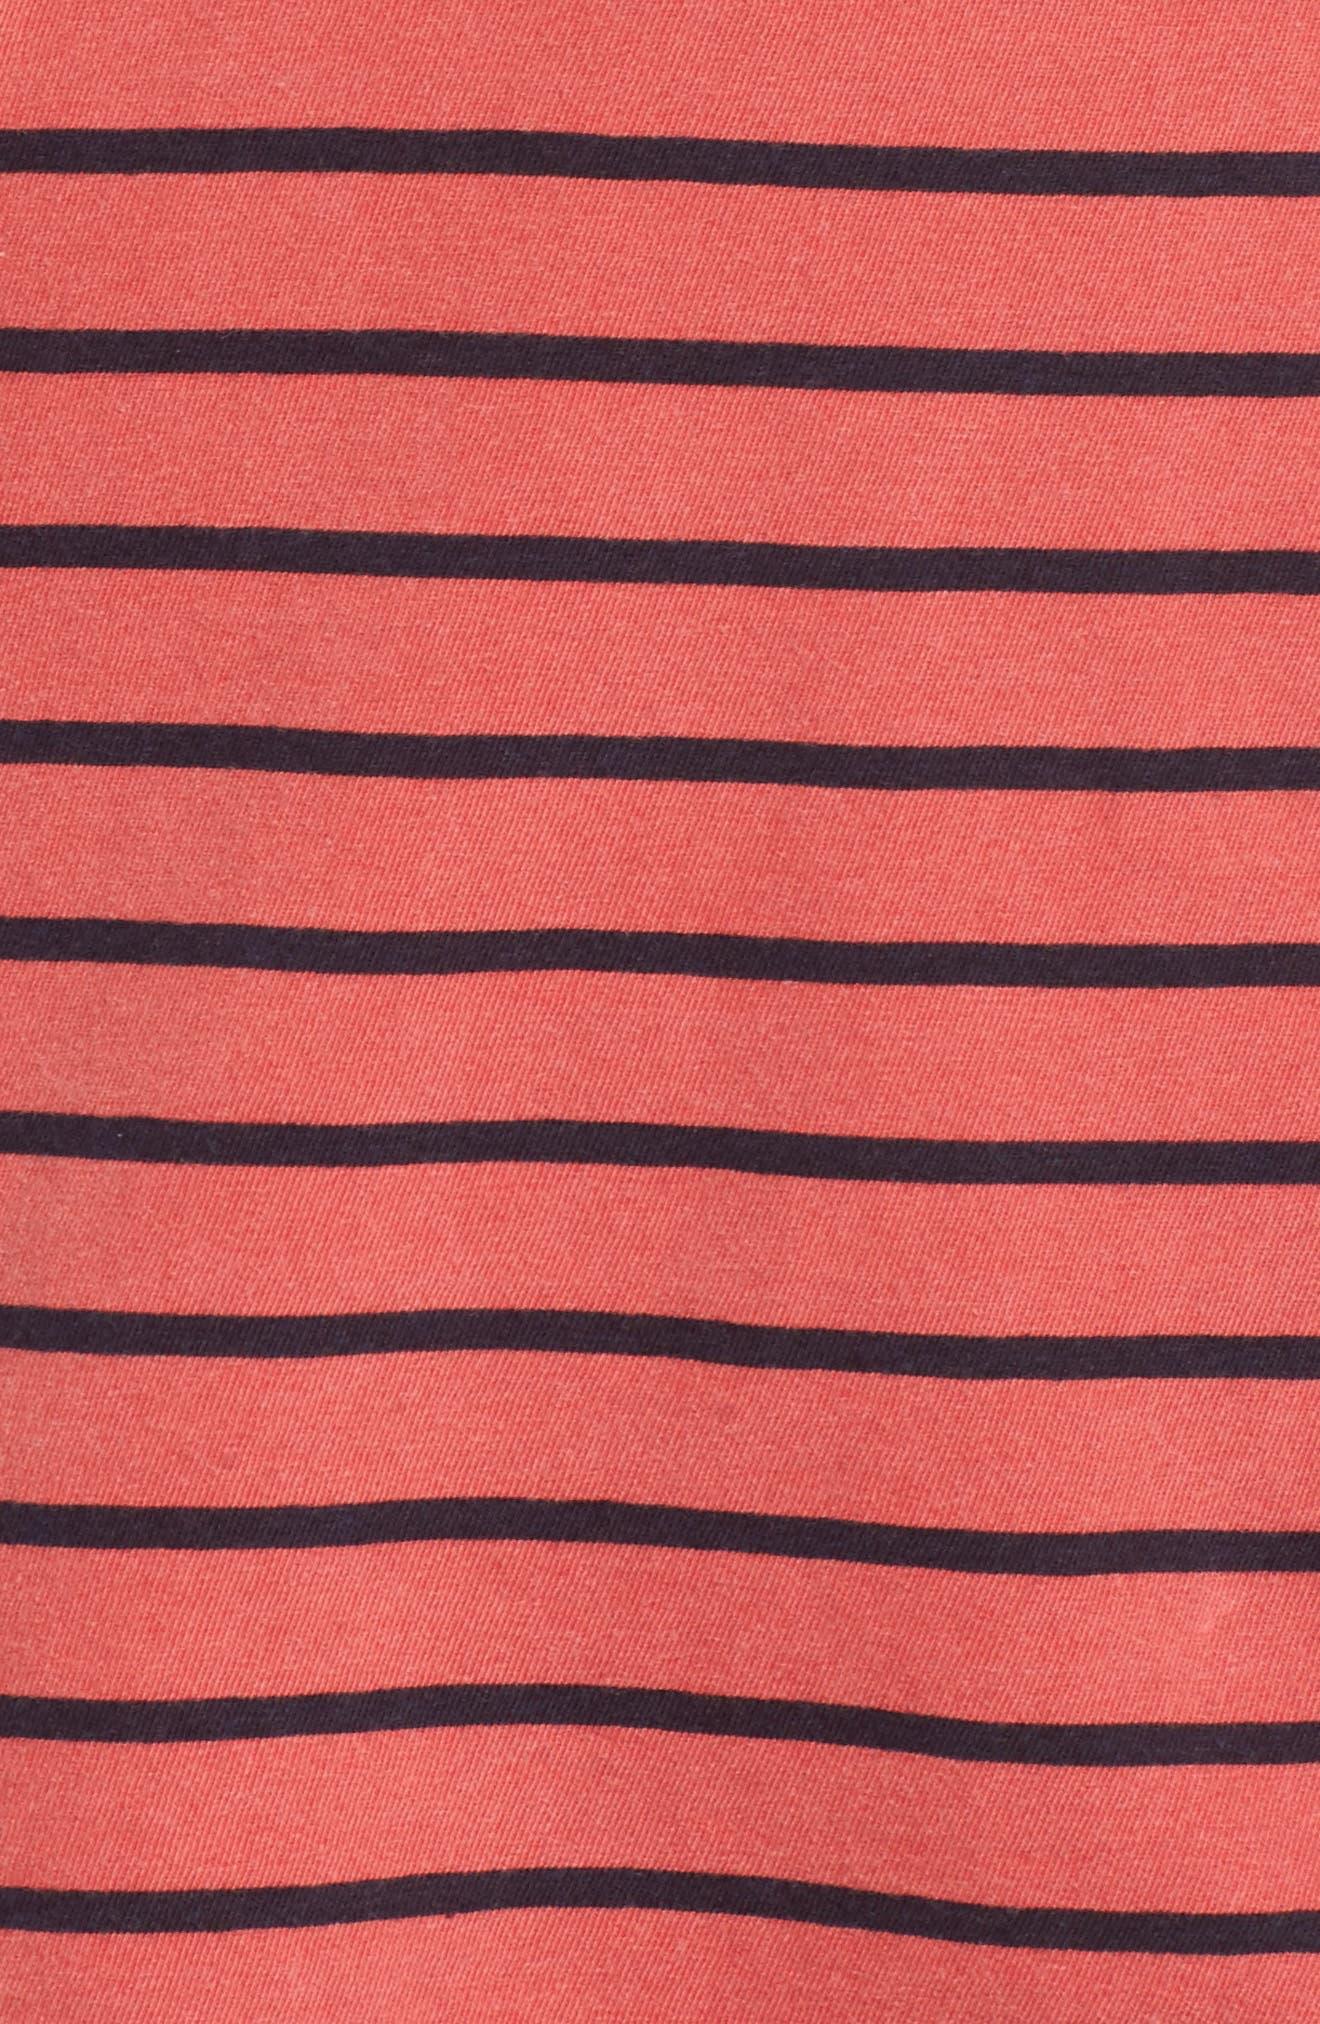 Stripe Button Tee,                             Alternate thumbnail 10, color,